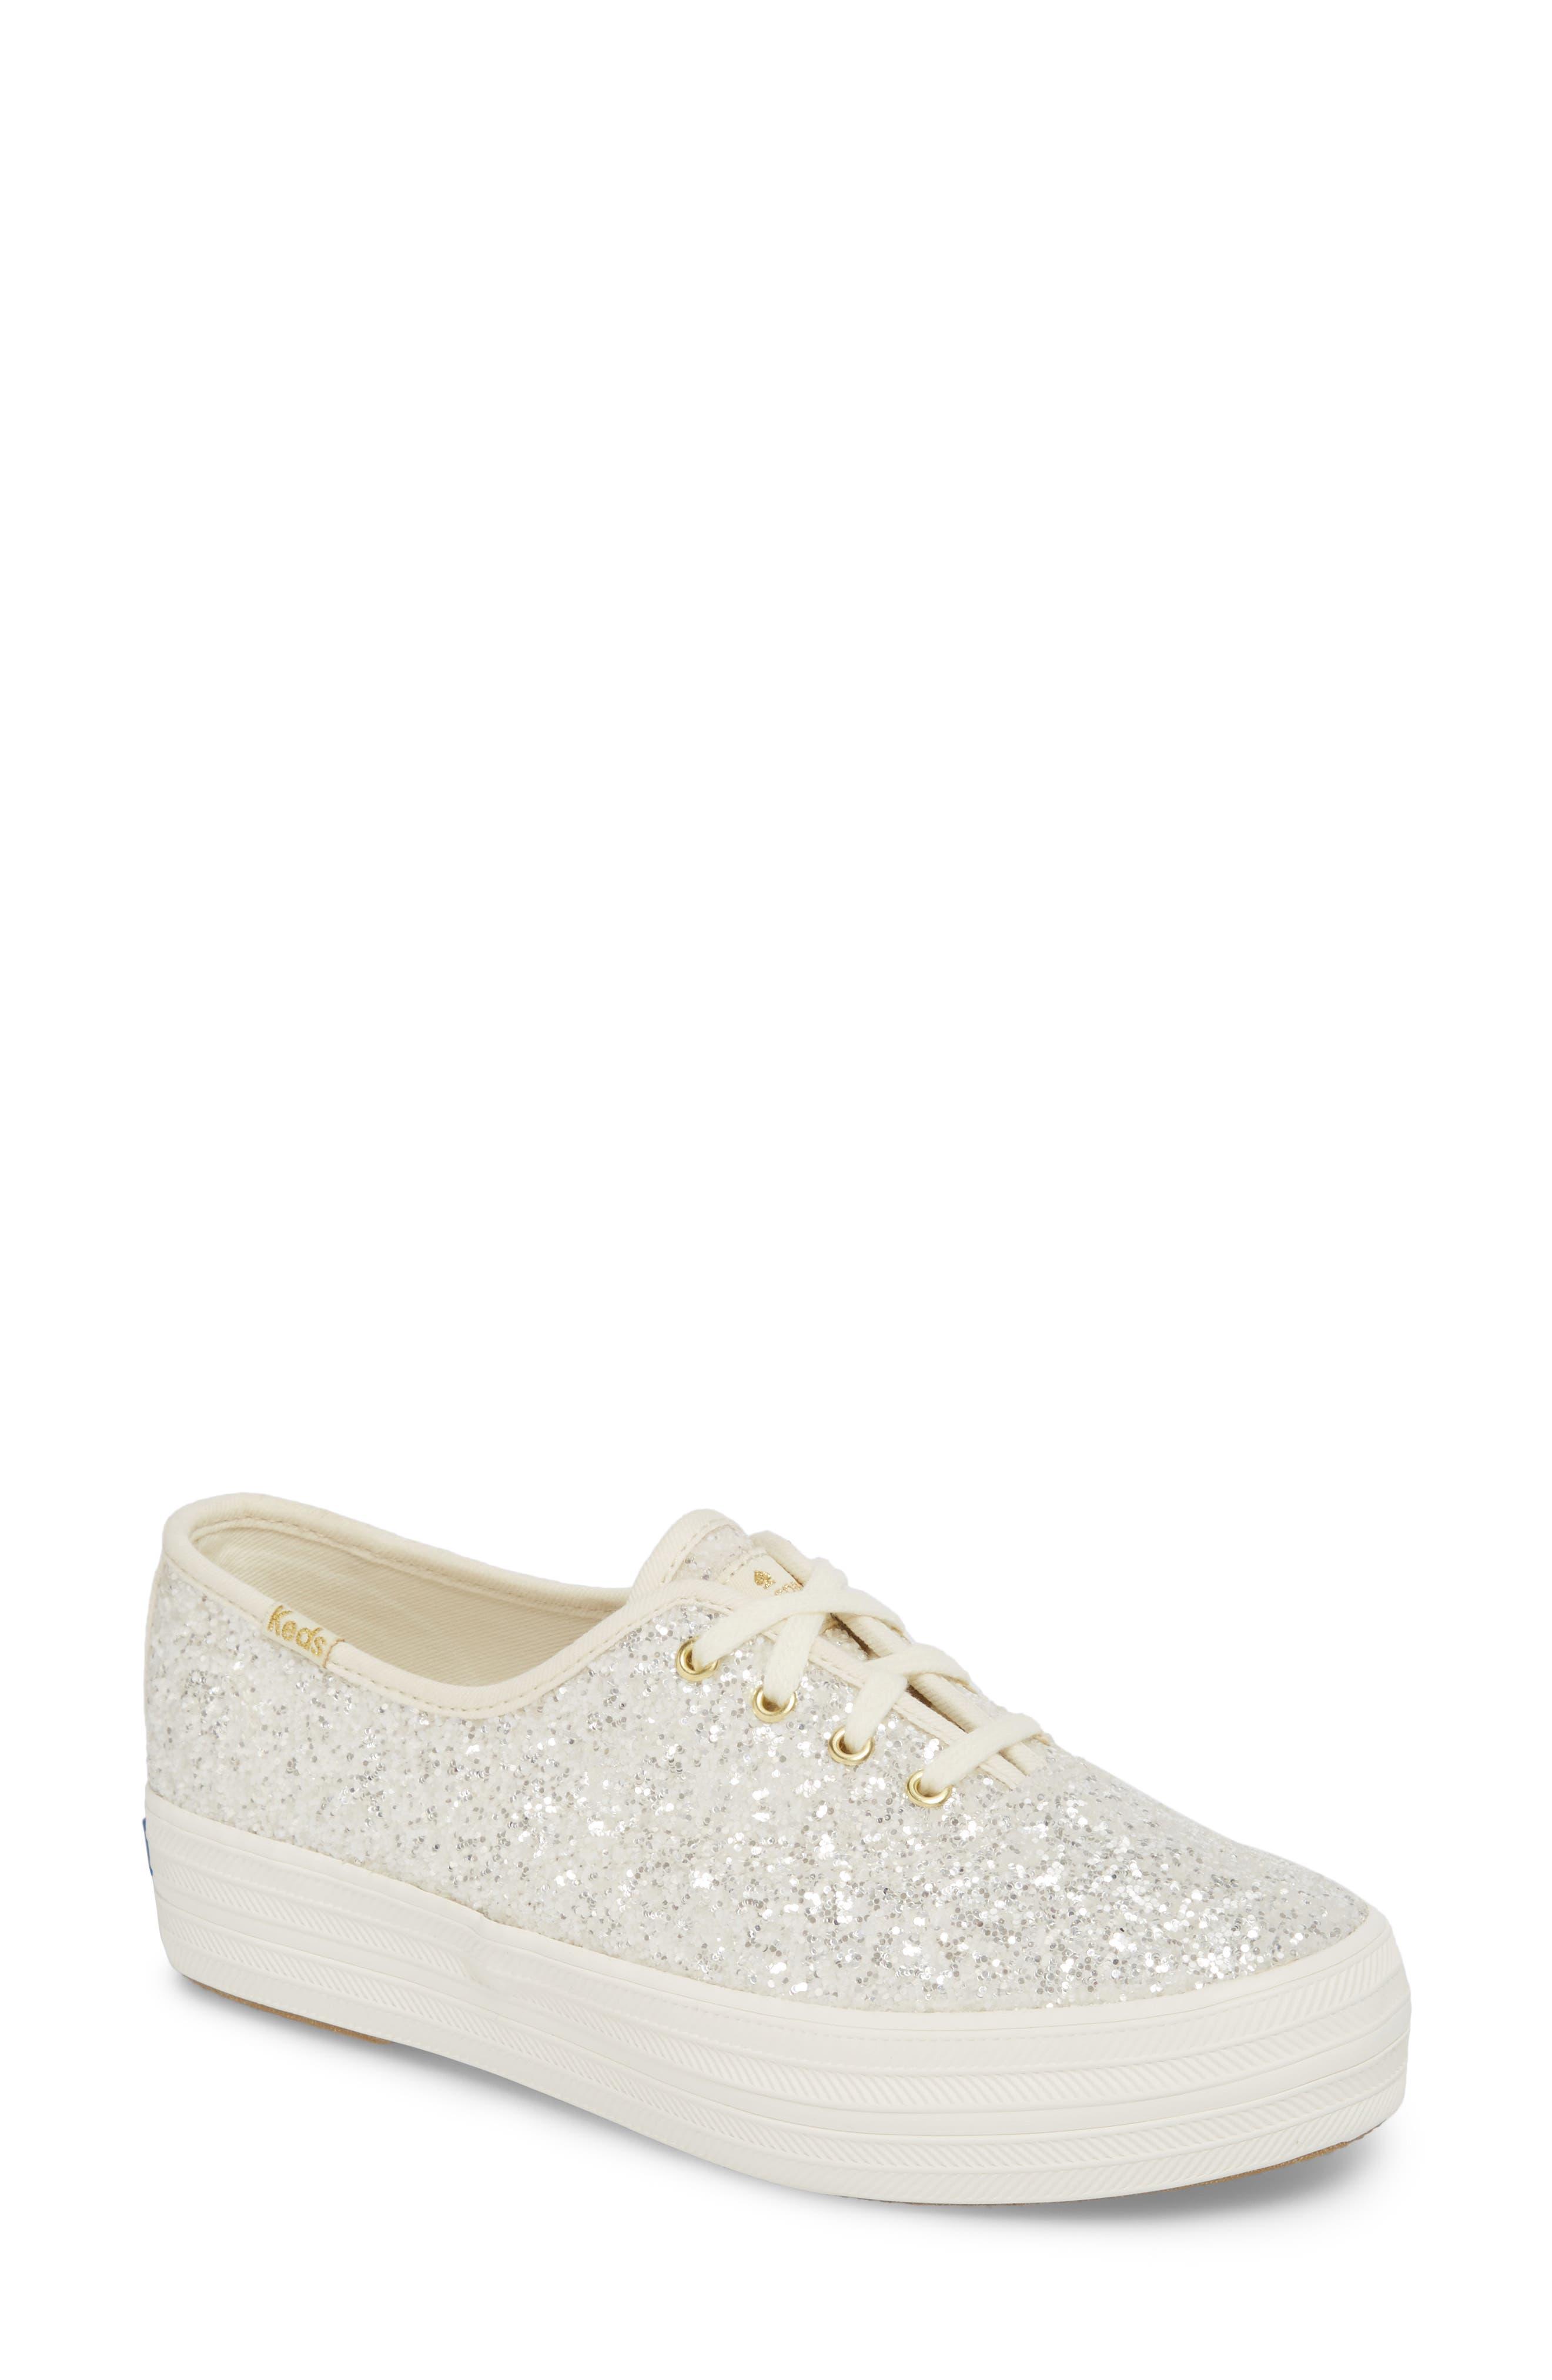 KEDS<SUP>®</SUP> FOR KATE SPADE NEW YORK triple decker glitter sneaker, Main, color, CREAM